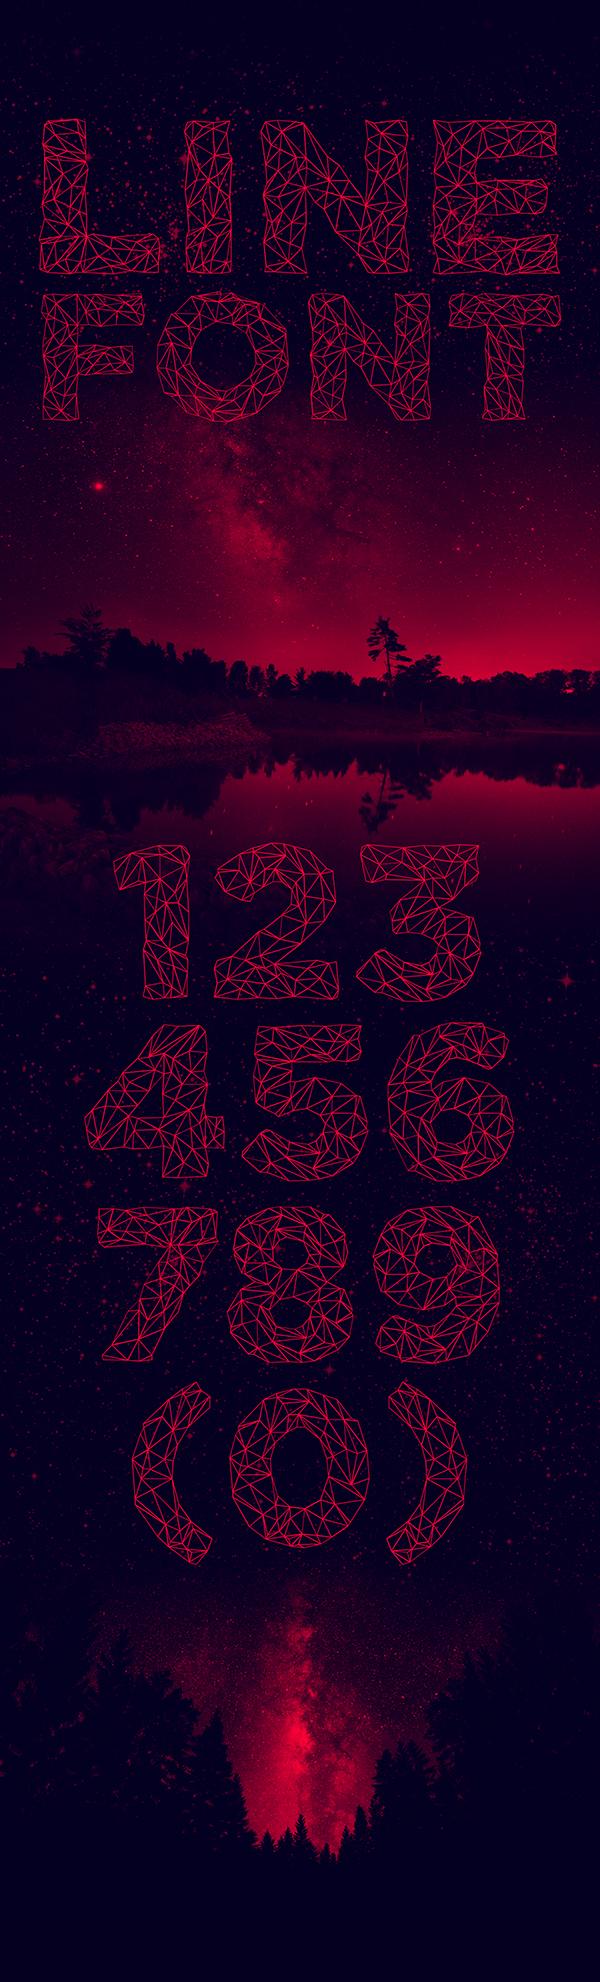 POLYA Free font - decorative